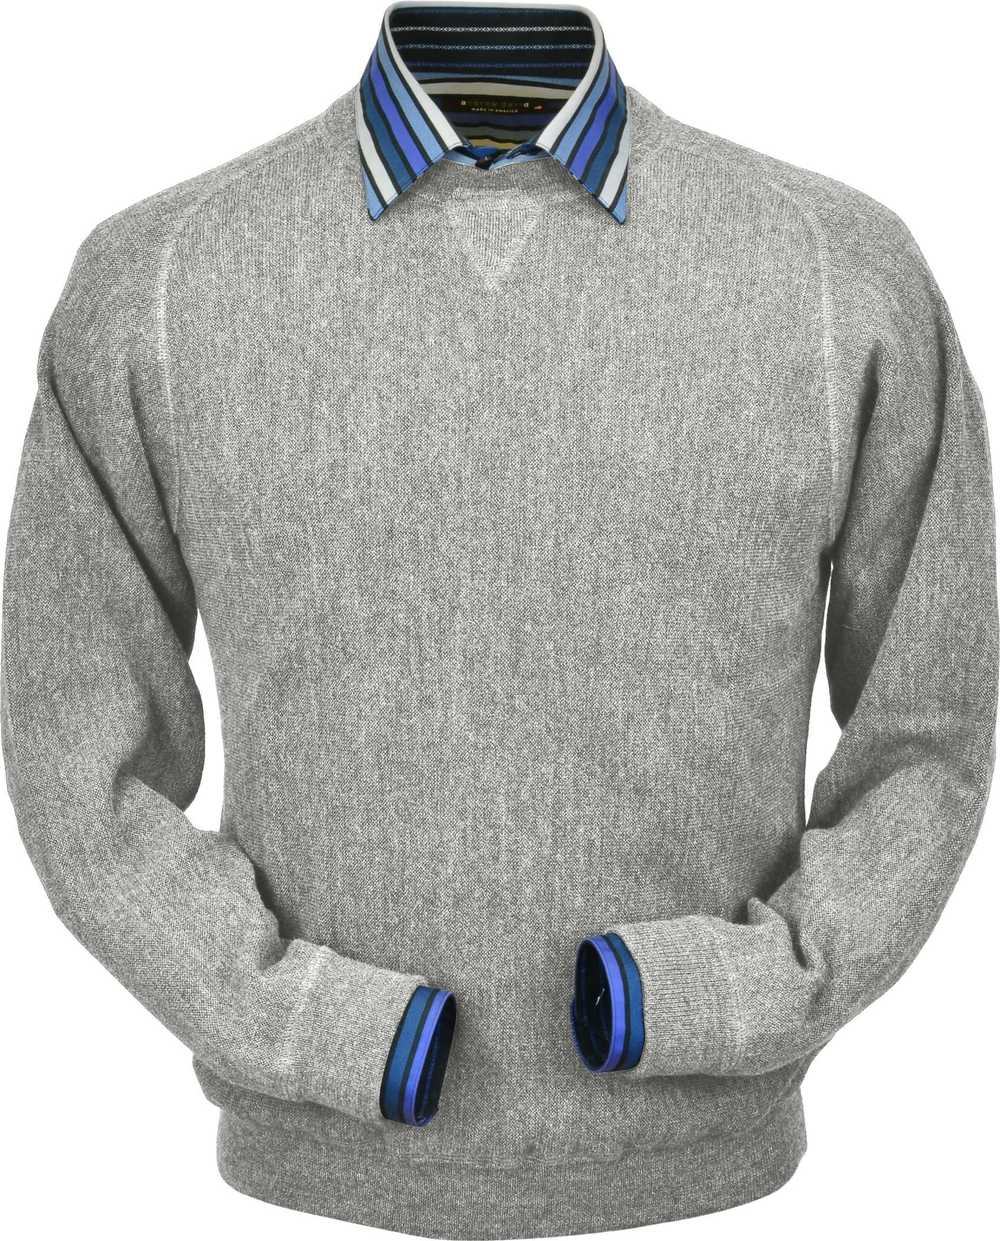 389ce43d2 Baby Alpaca Sweatshirt (Classic Fit) — Peru Unlimited Corp.